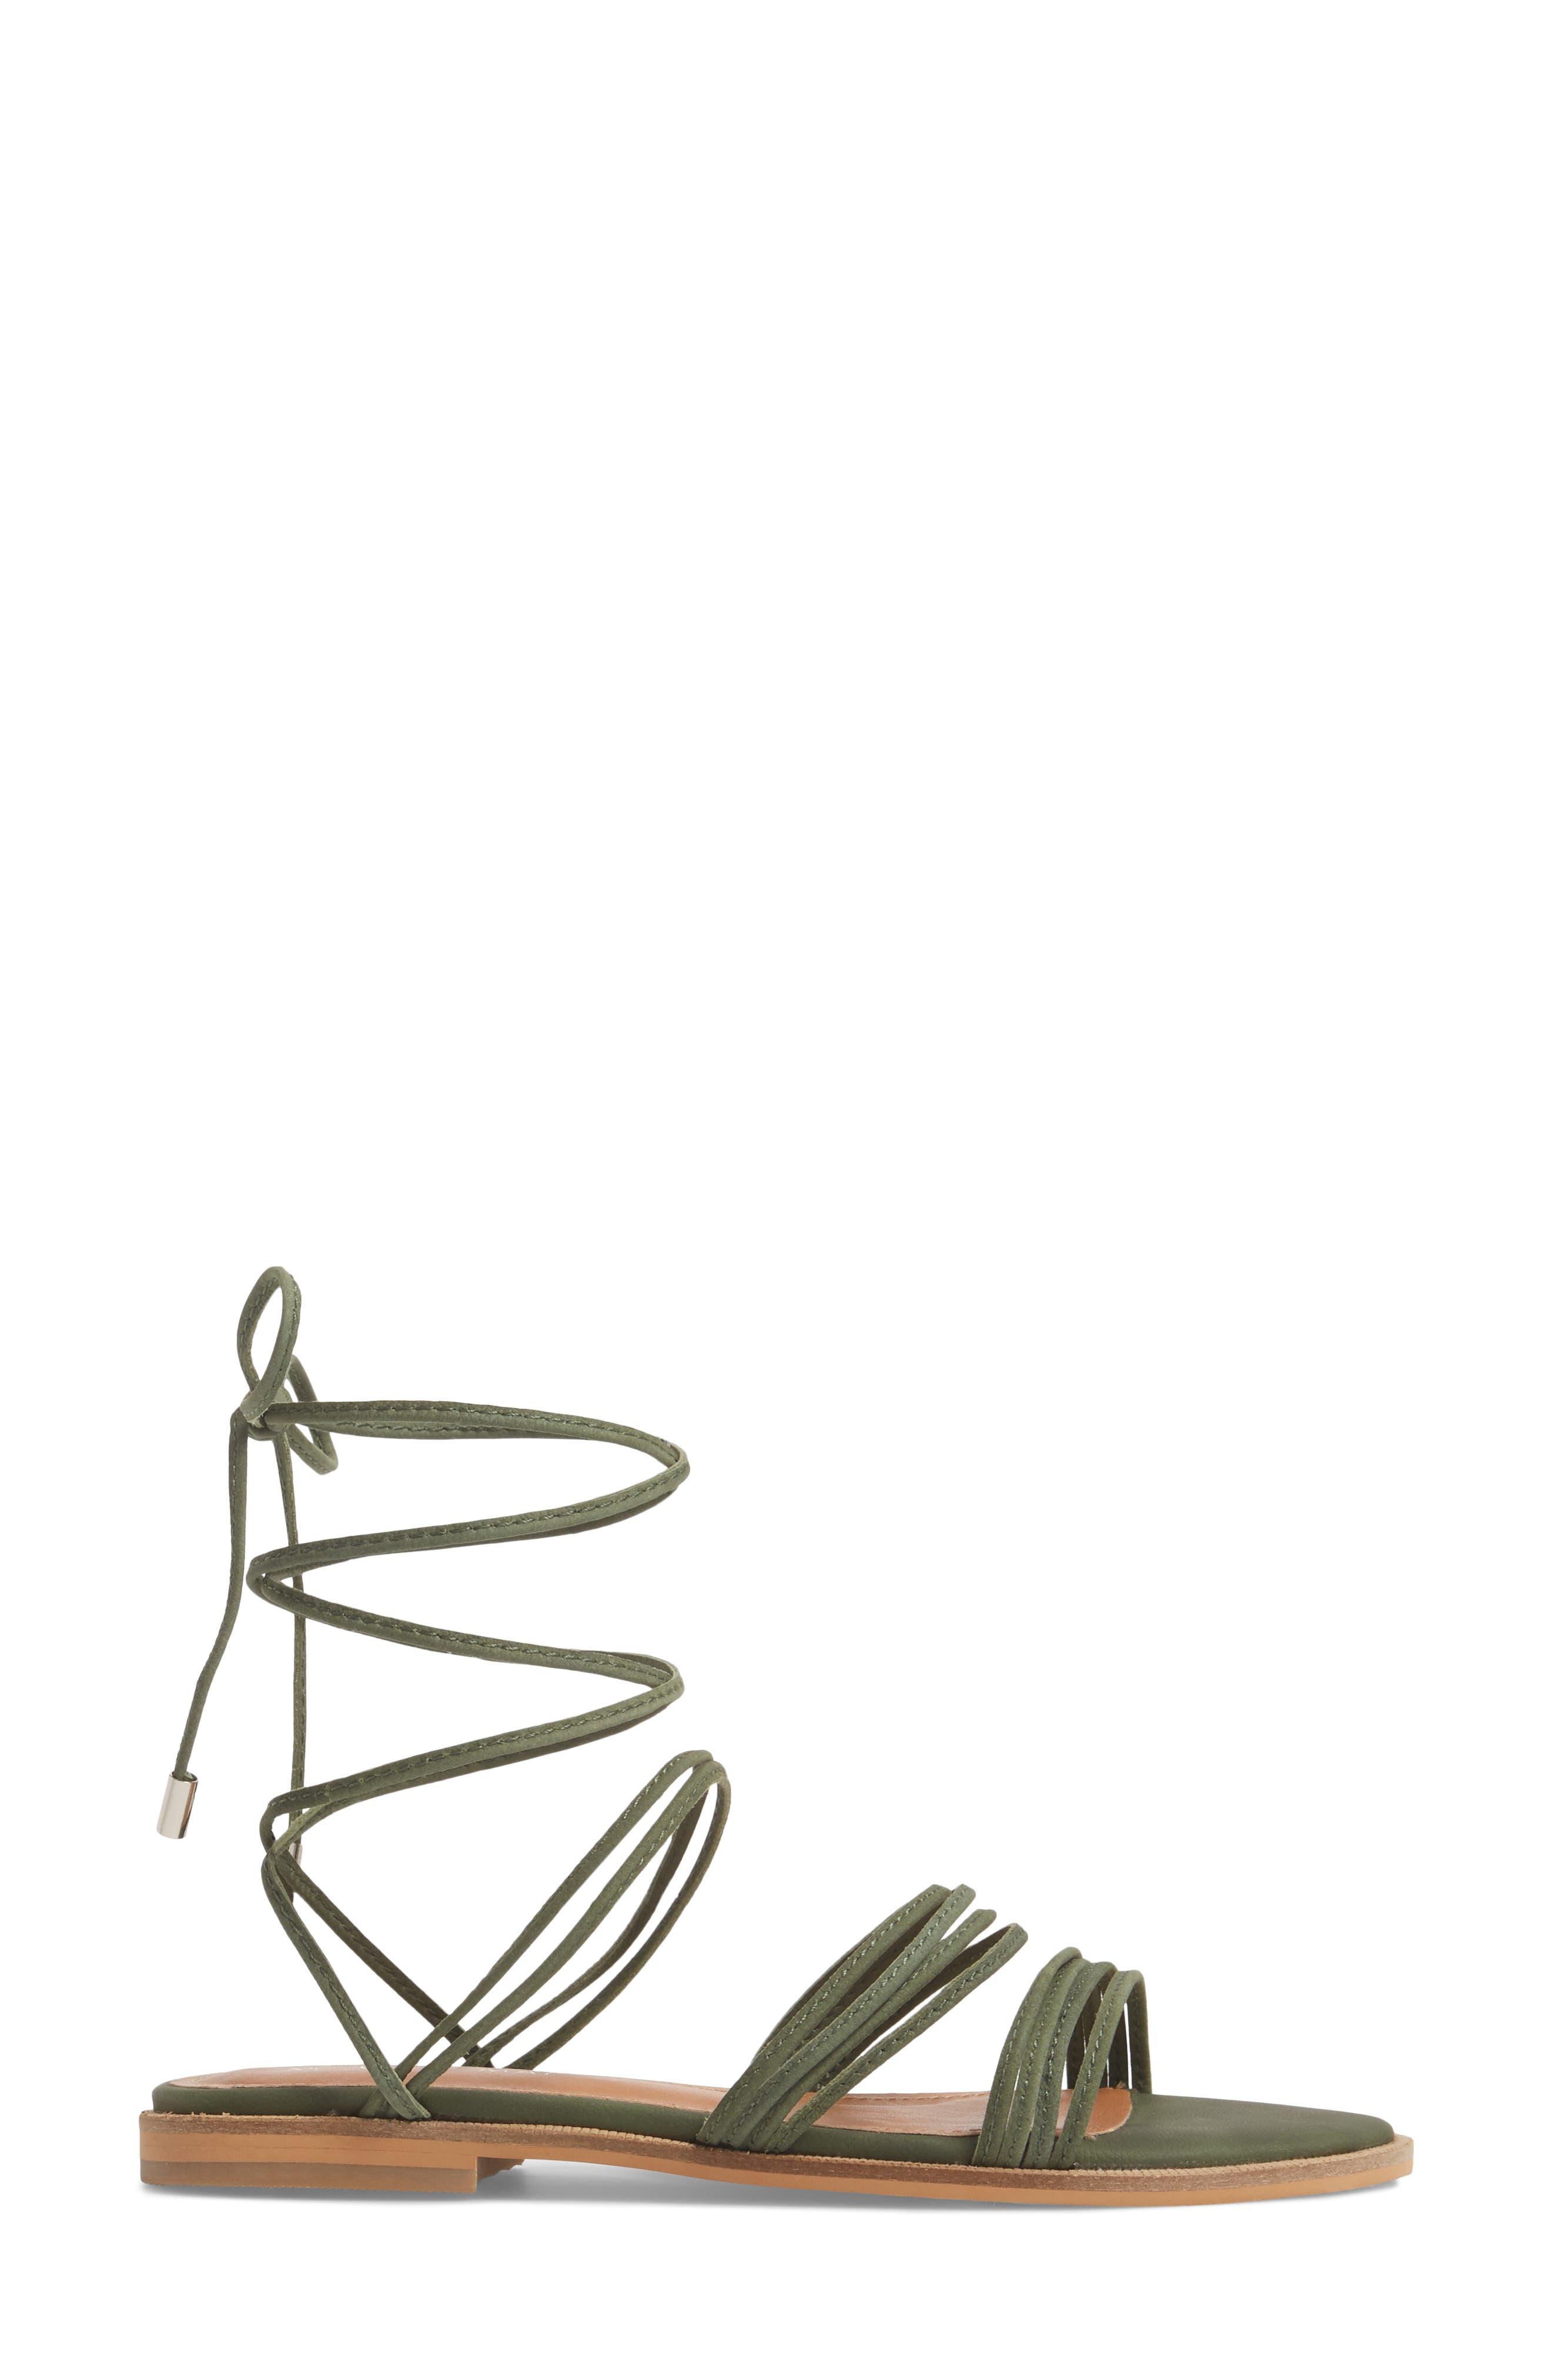 Theory Strappy Flat Sandal,                             Alternate thumbnail 3, color,                             Khaki Leather